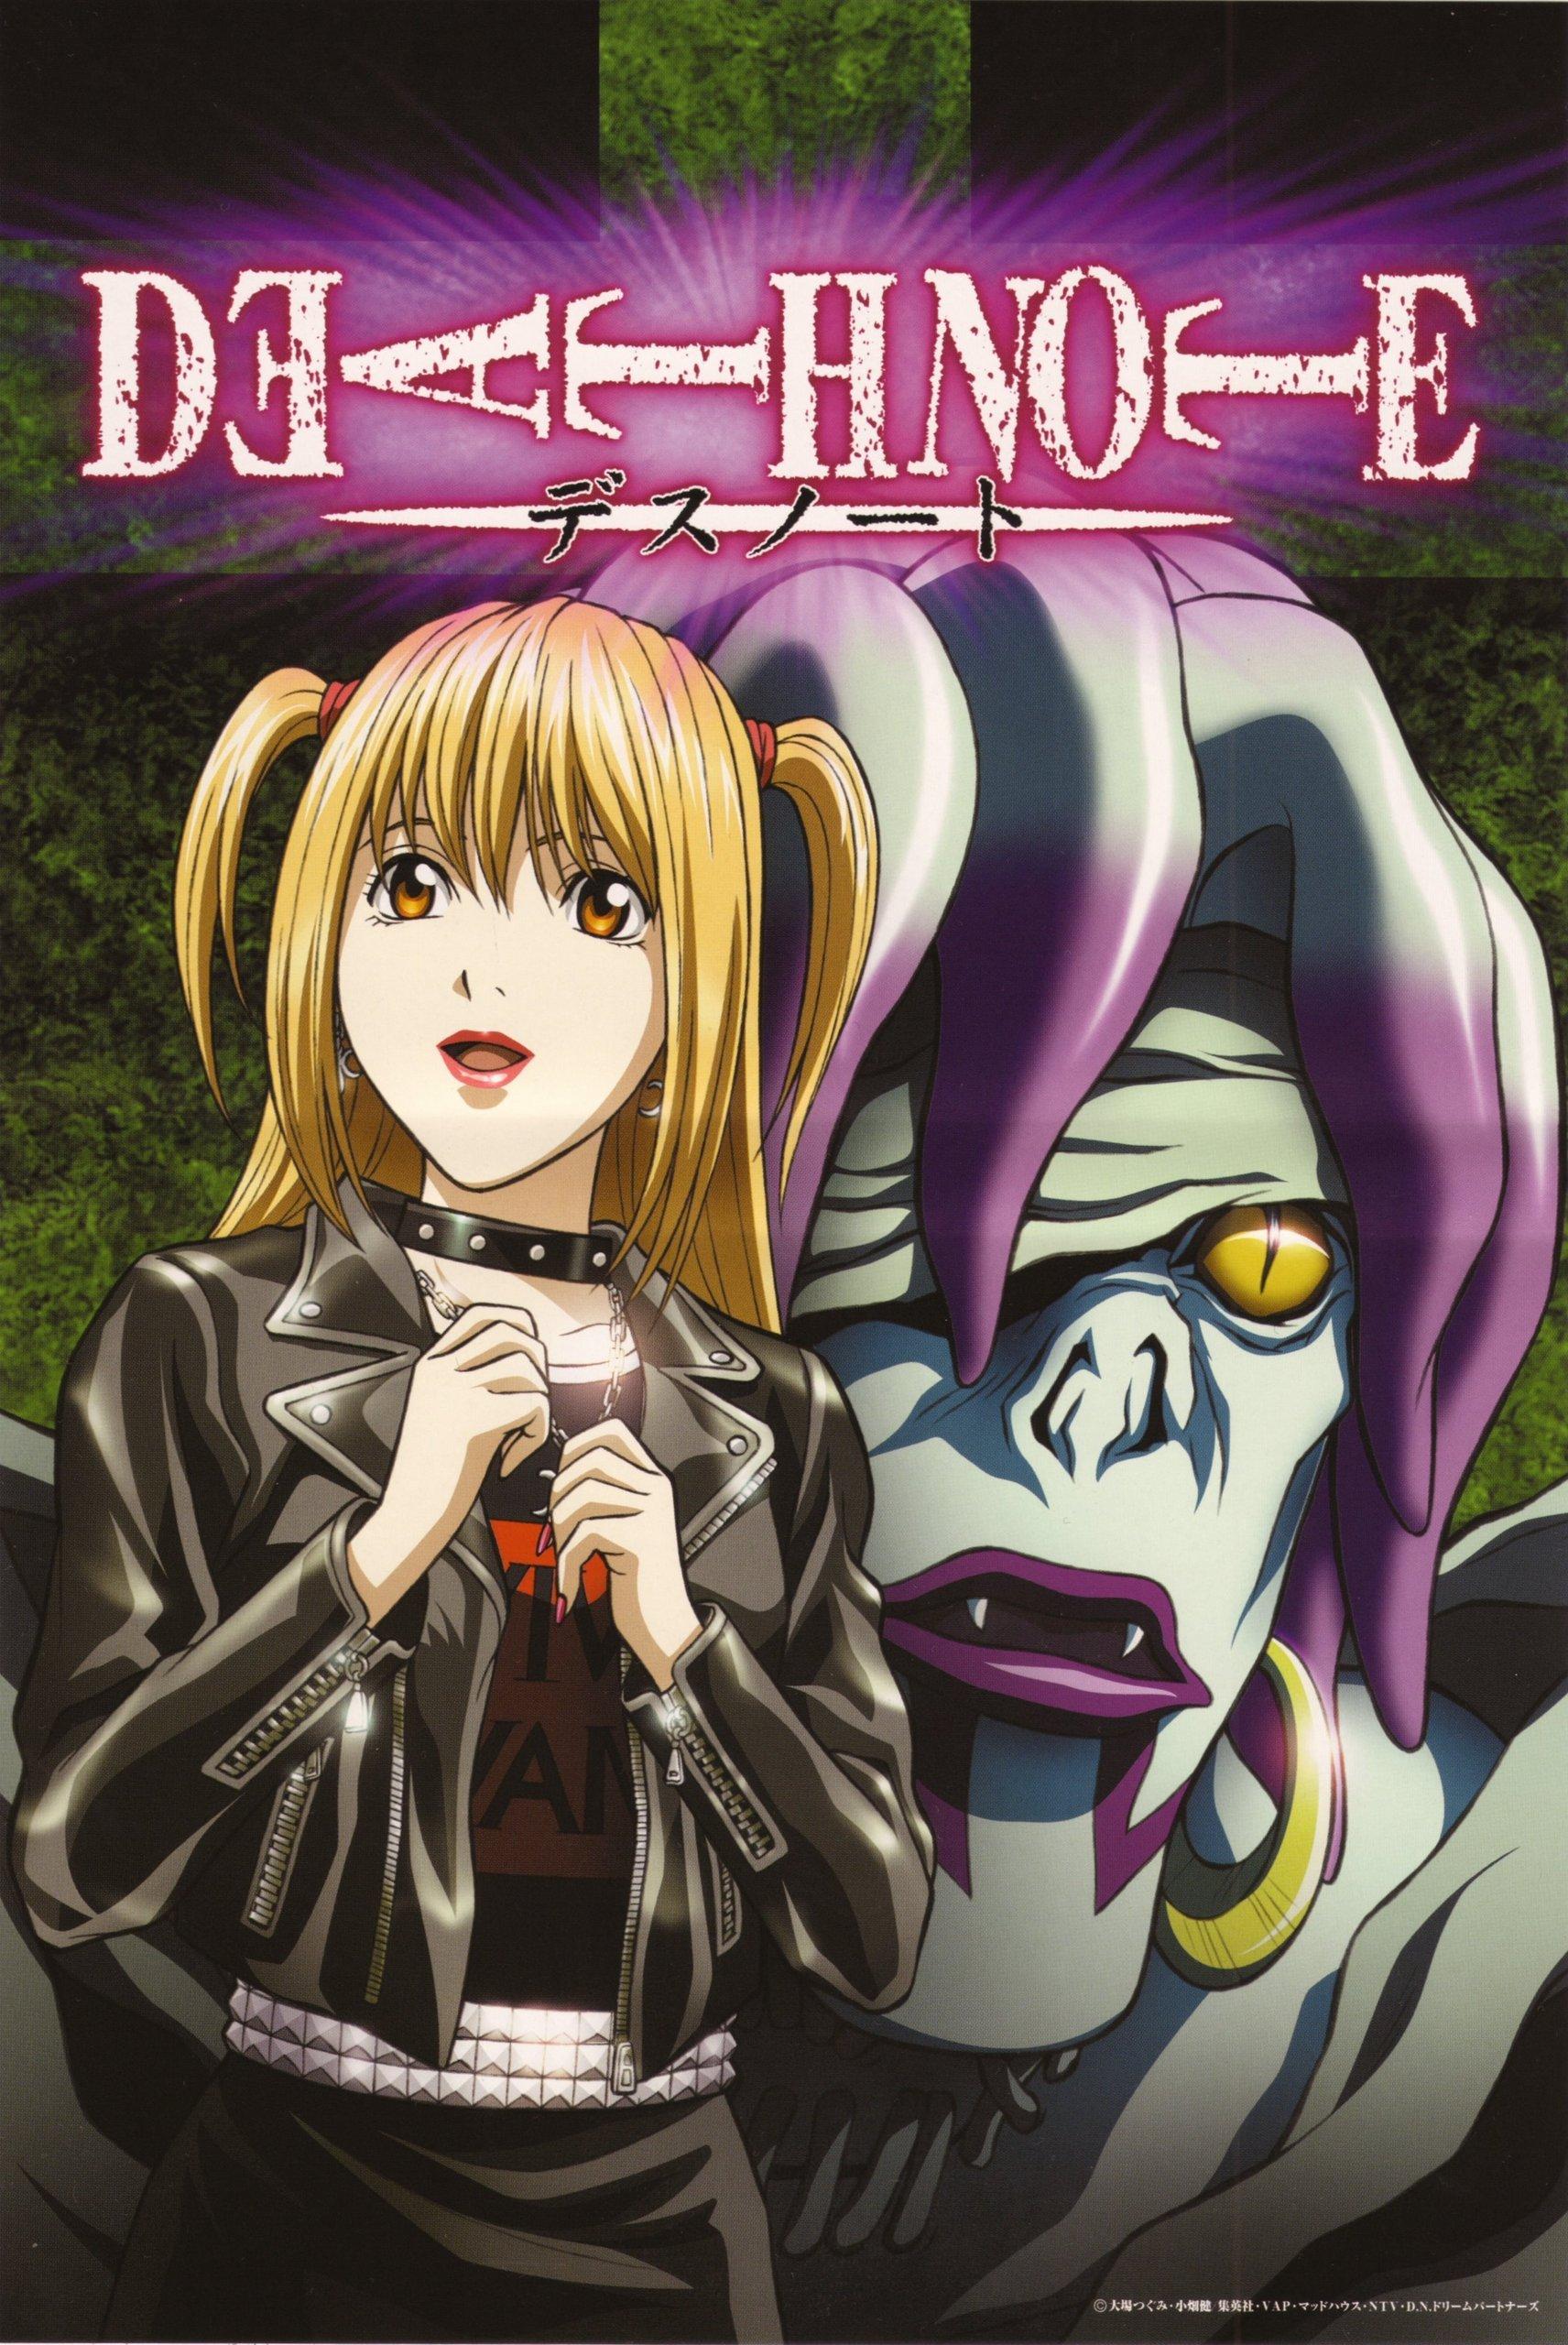 Classic Girl Wallpaper Misa Amp Rem Death Note Photo 3344905 Fanpop